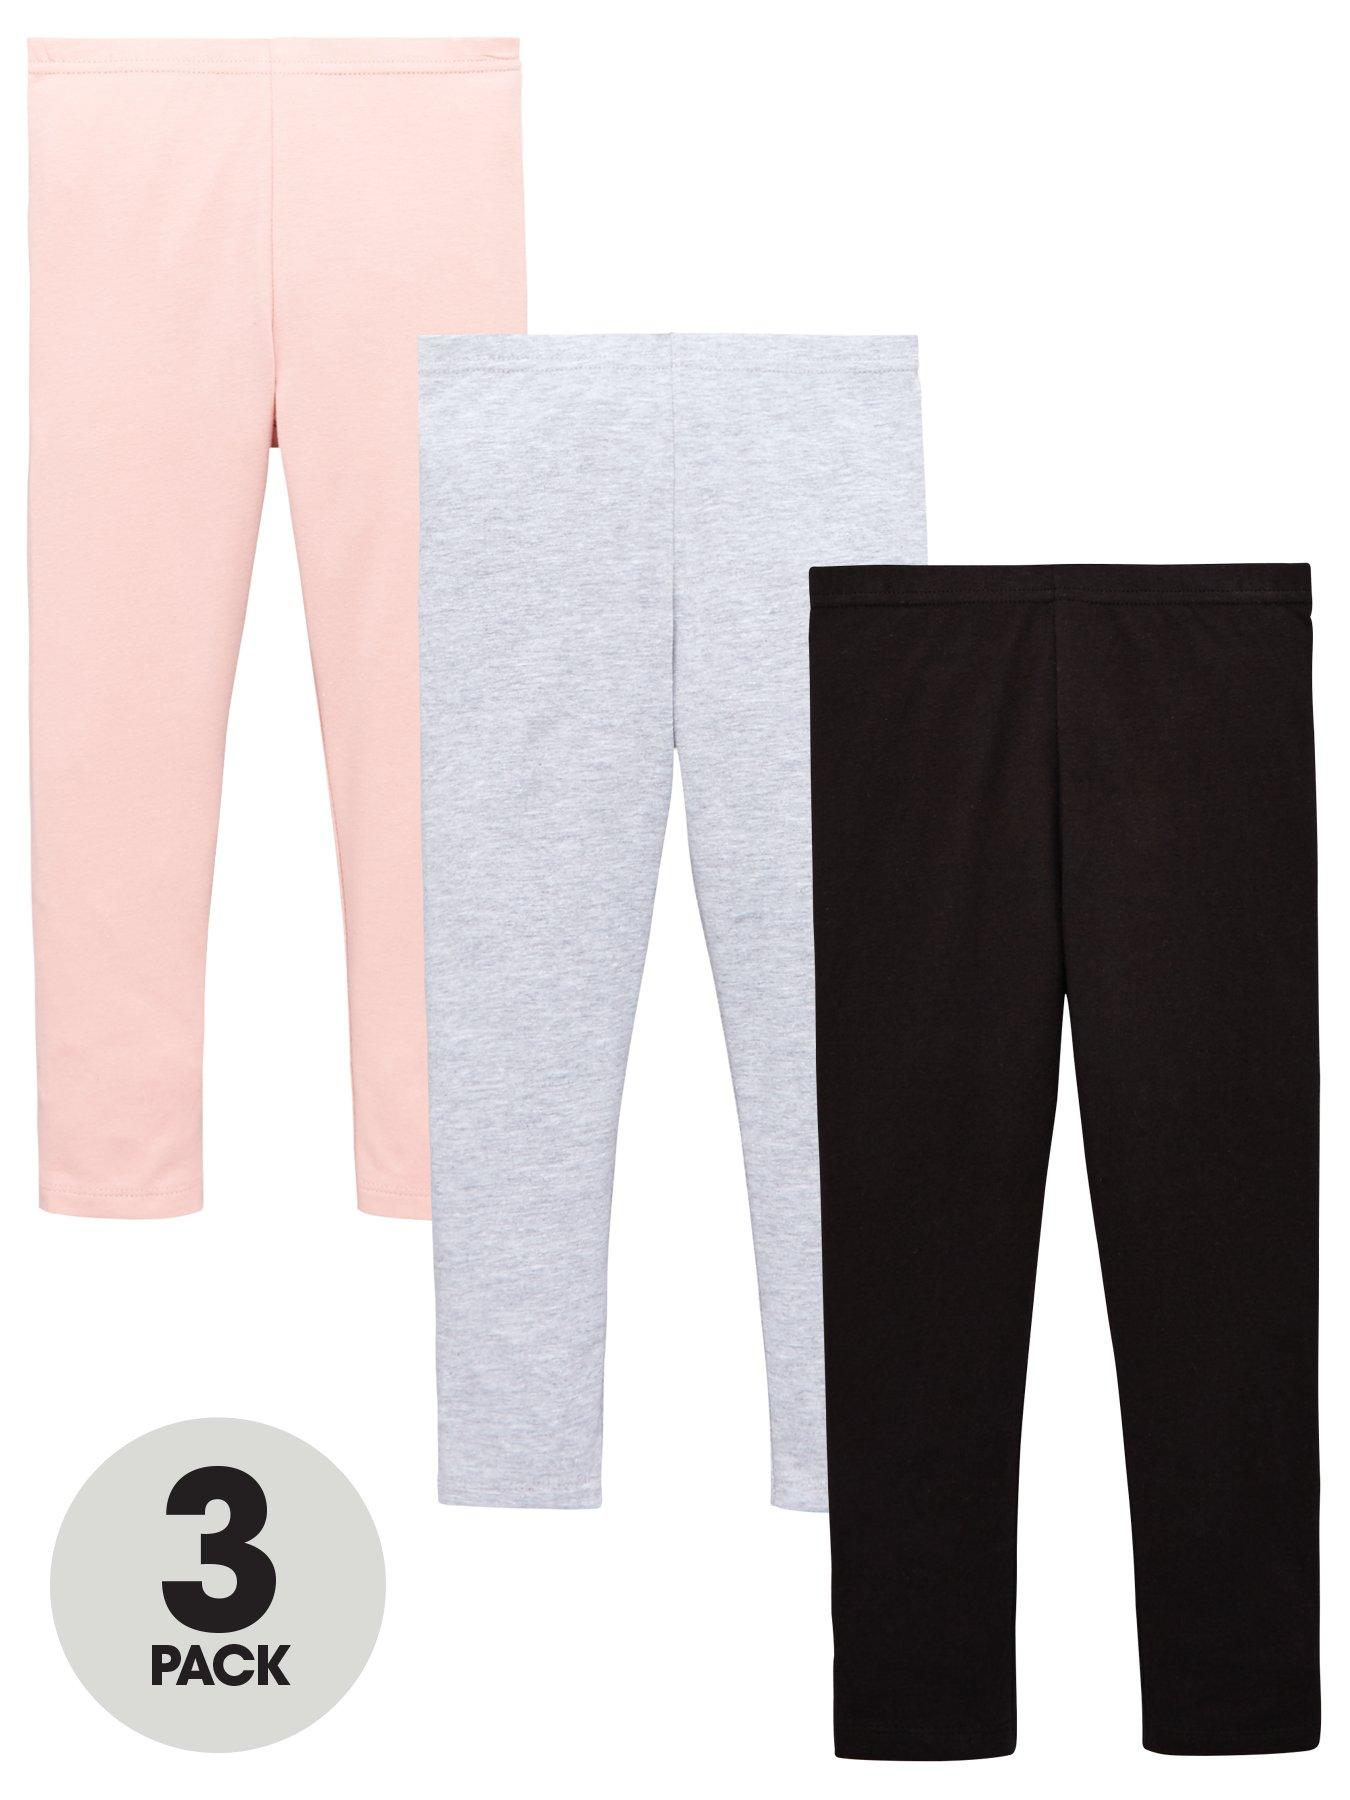 Designer Wear With Easy Stretch Girls Legging Plain 2pk 95/% Cotton 5/% Elastane